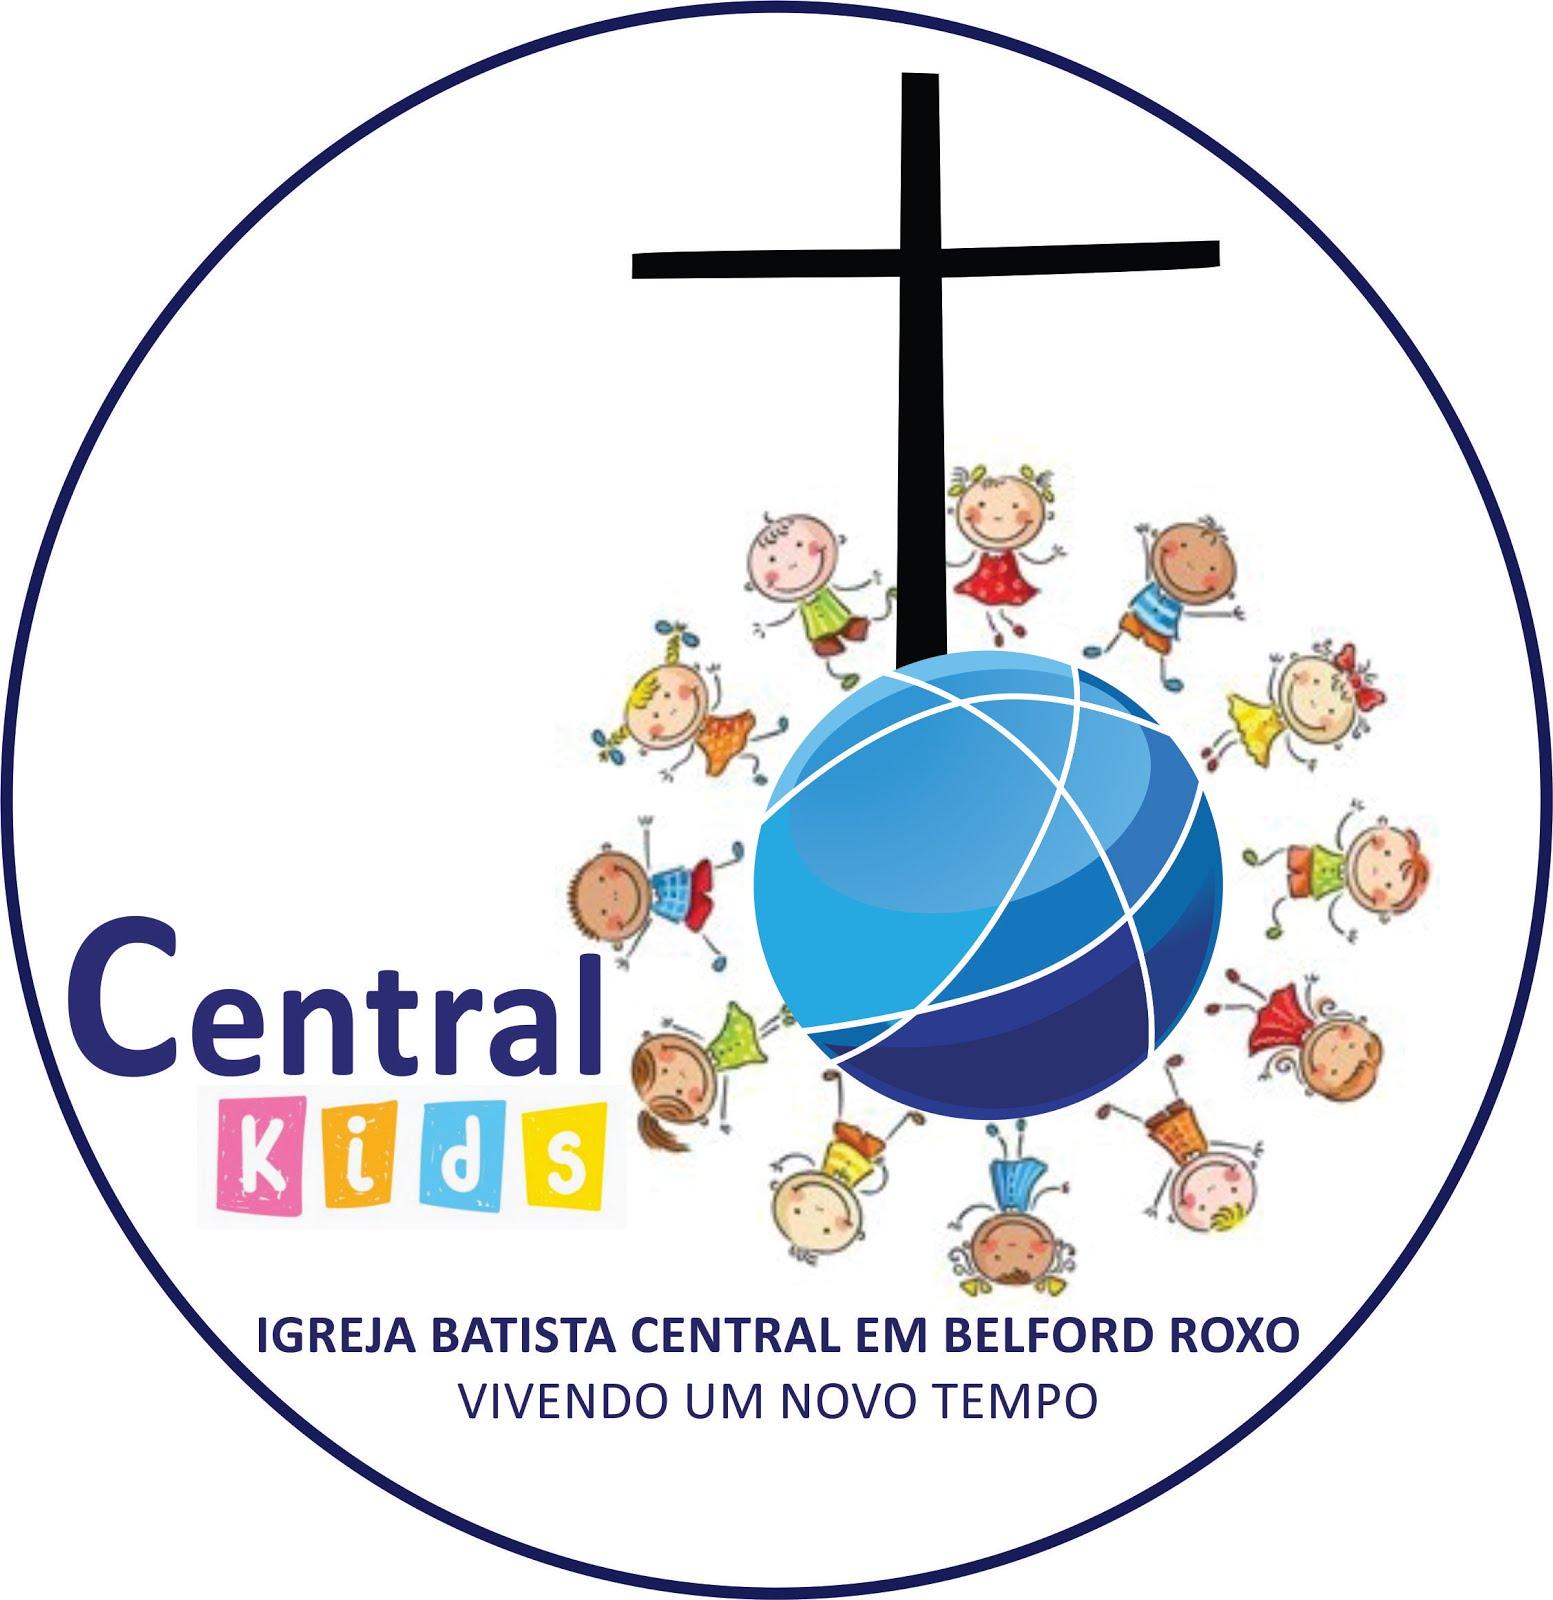 Ministério Central Kids